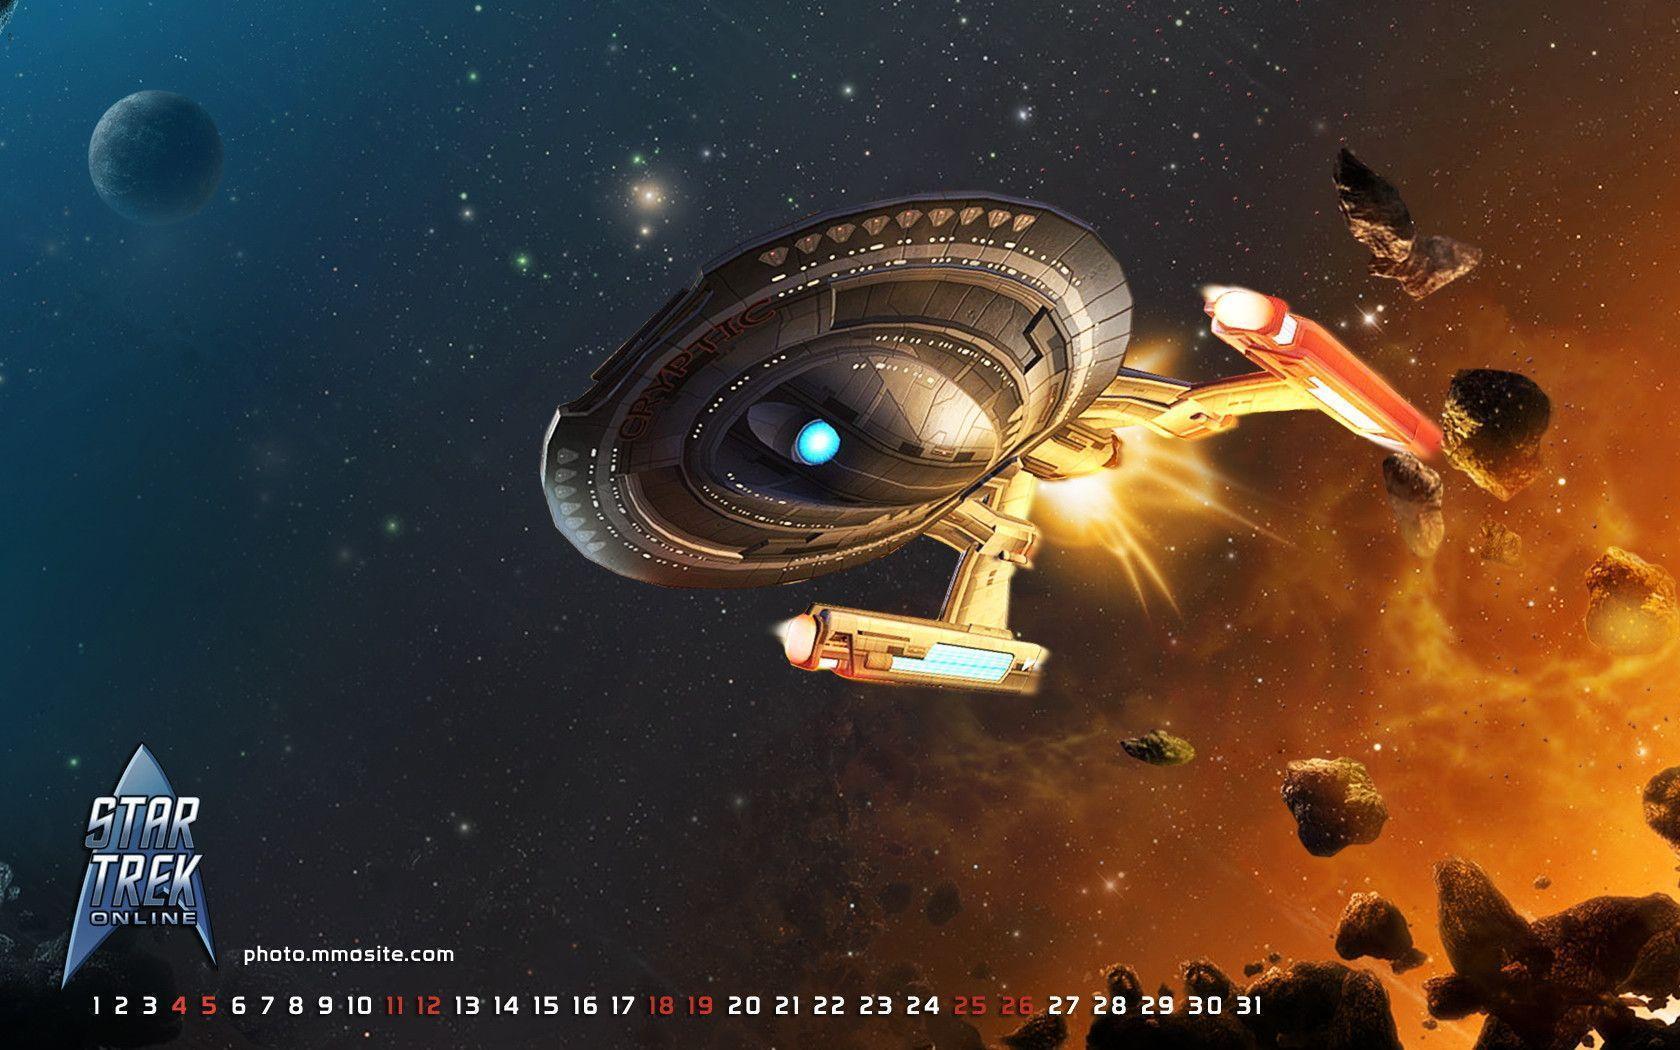 download Star Trek Online Wallpapers [1680x1050] for your 1680x1050